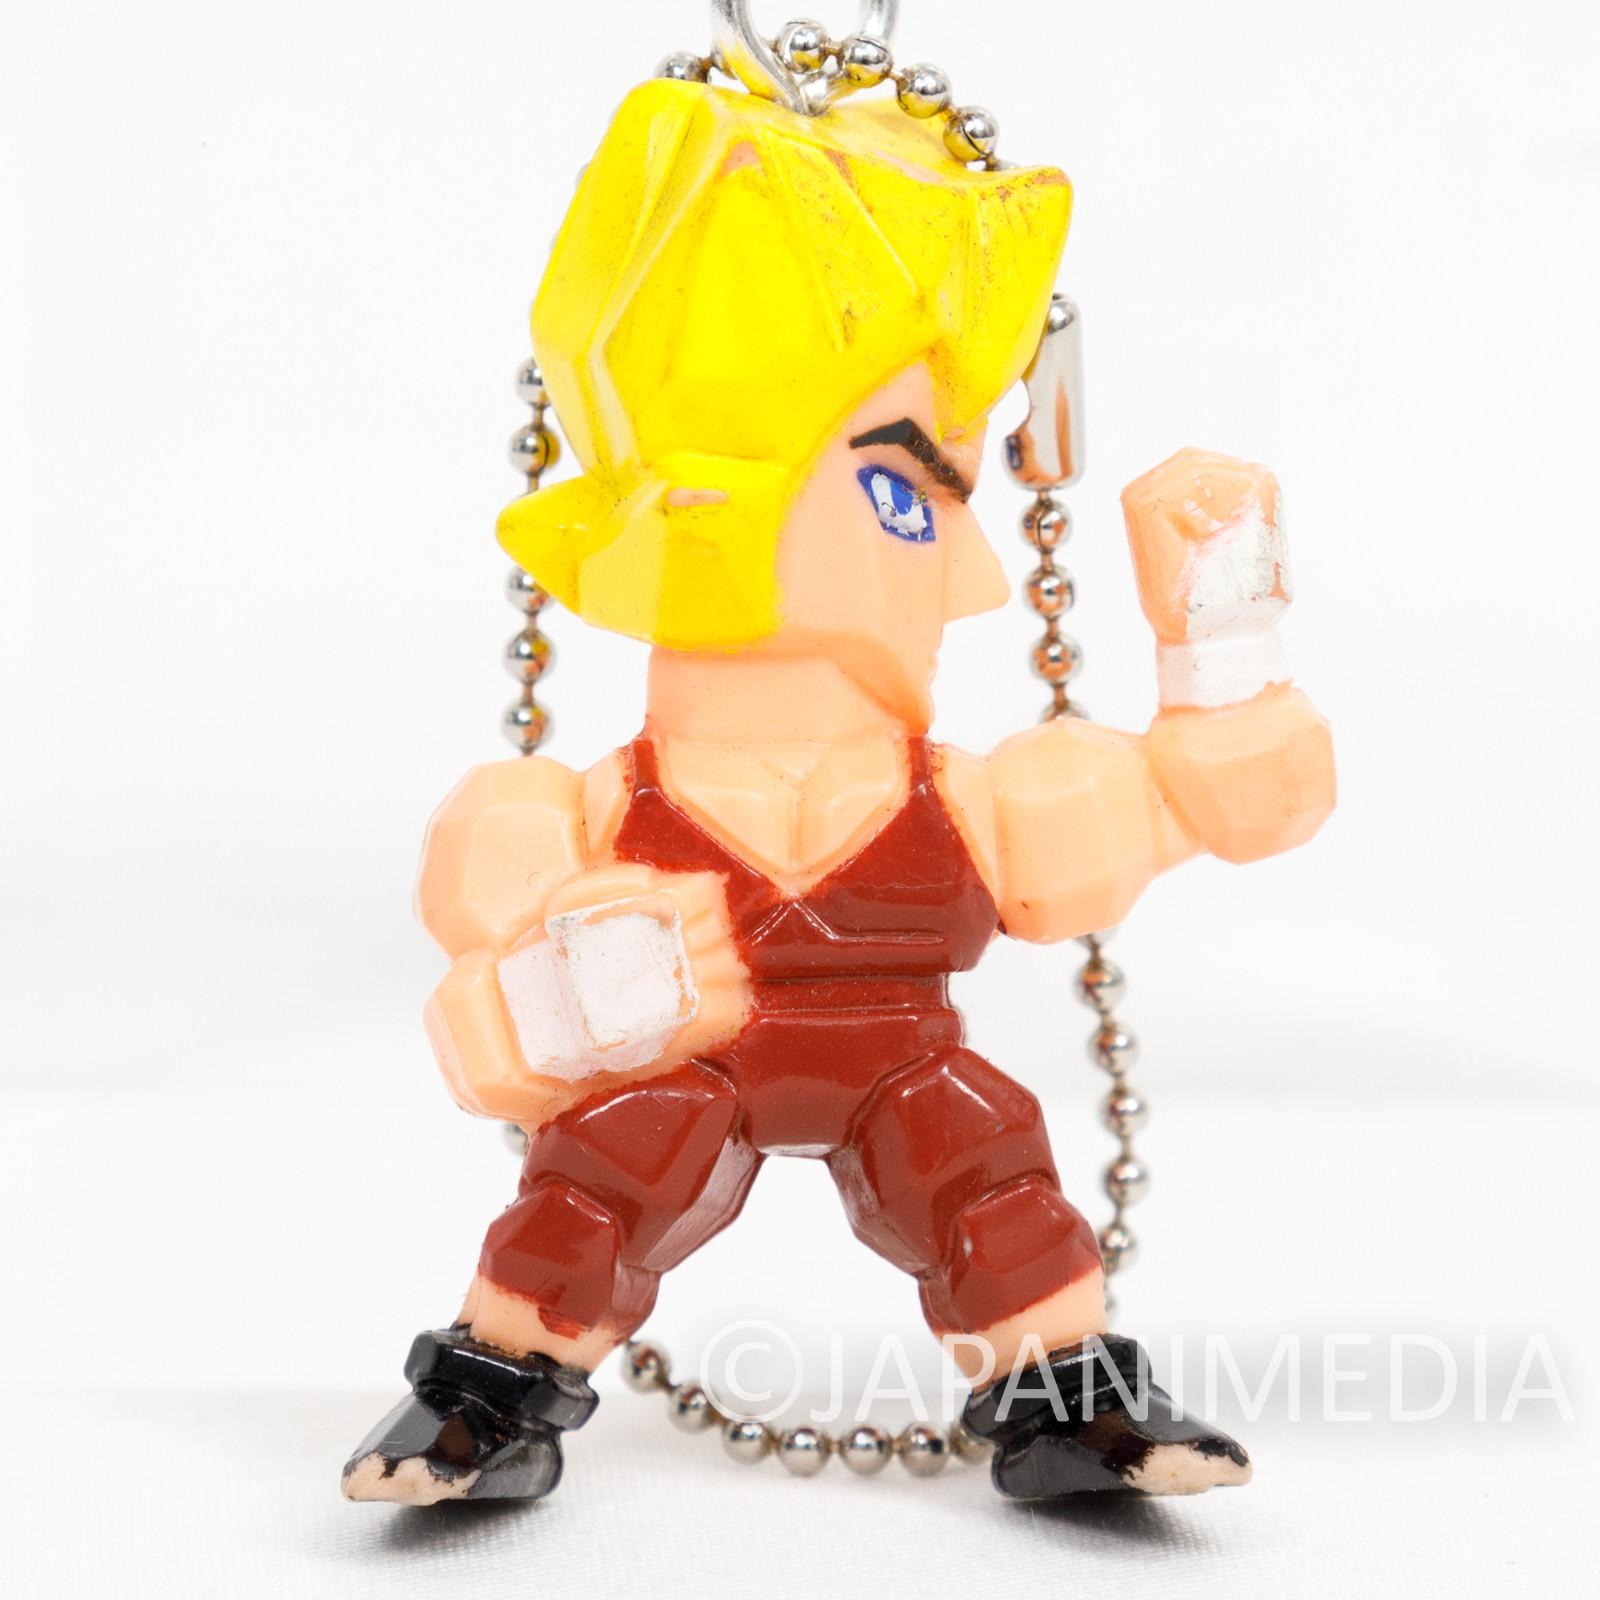 Virtua Fighter Jacky Bryant Mini Figure Ballchain JAPAN GAME